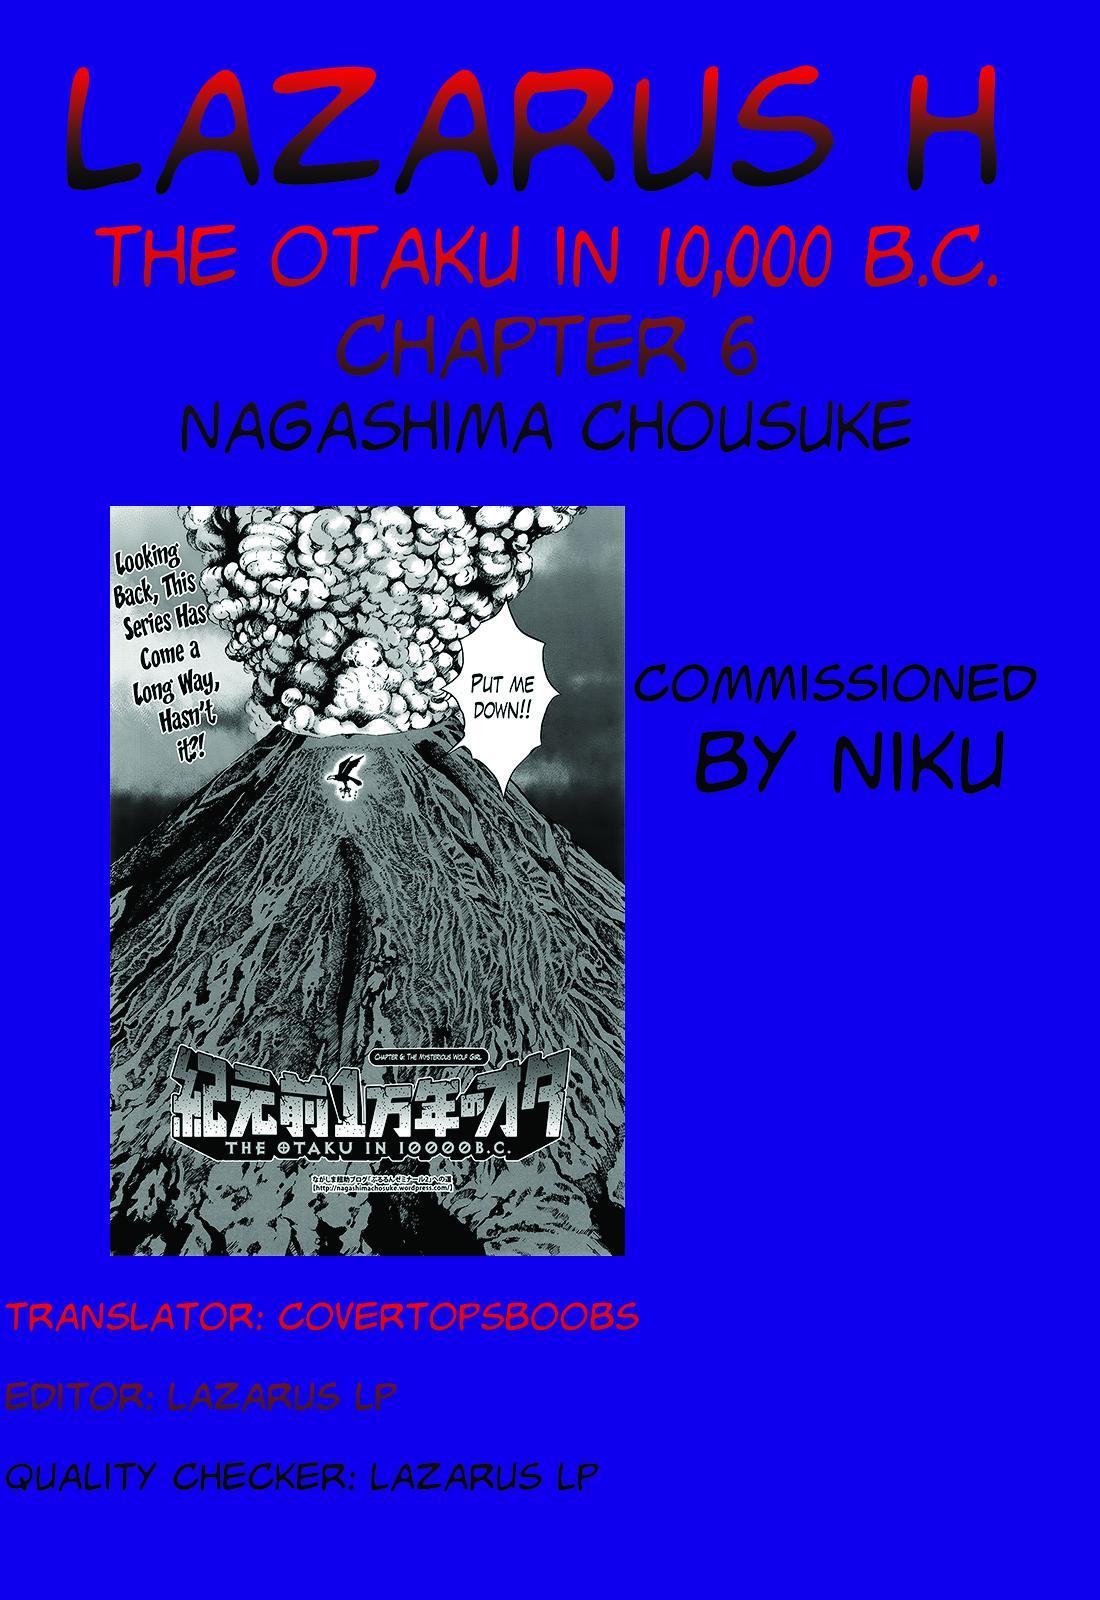 Kigenzen 10000 Nen no Ota   The Otaku in 10,000 B.C. Ch. 1-22 117